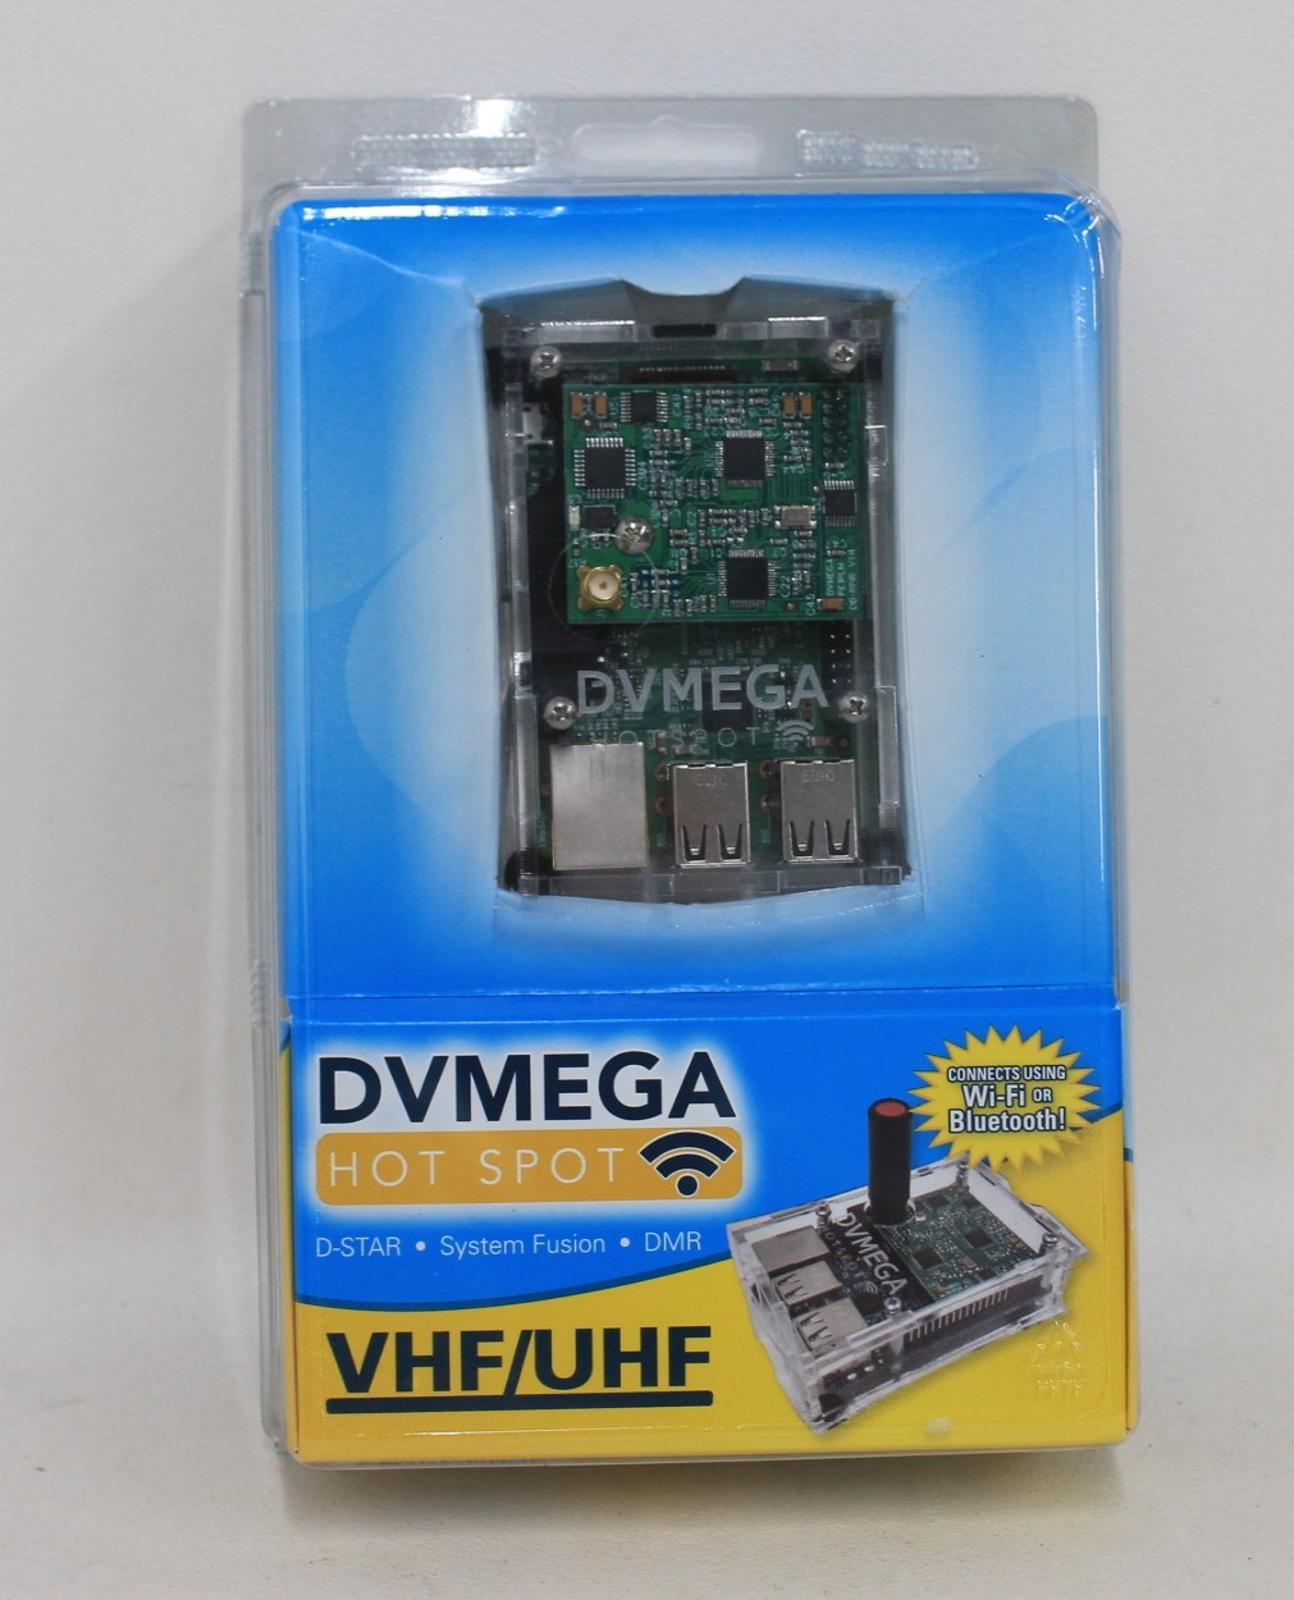 NEW DVMEGA HOT SPOT Dual band VHF/UHF Prebuilt Hotspot Kit For Digital Radios - 2